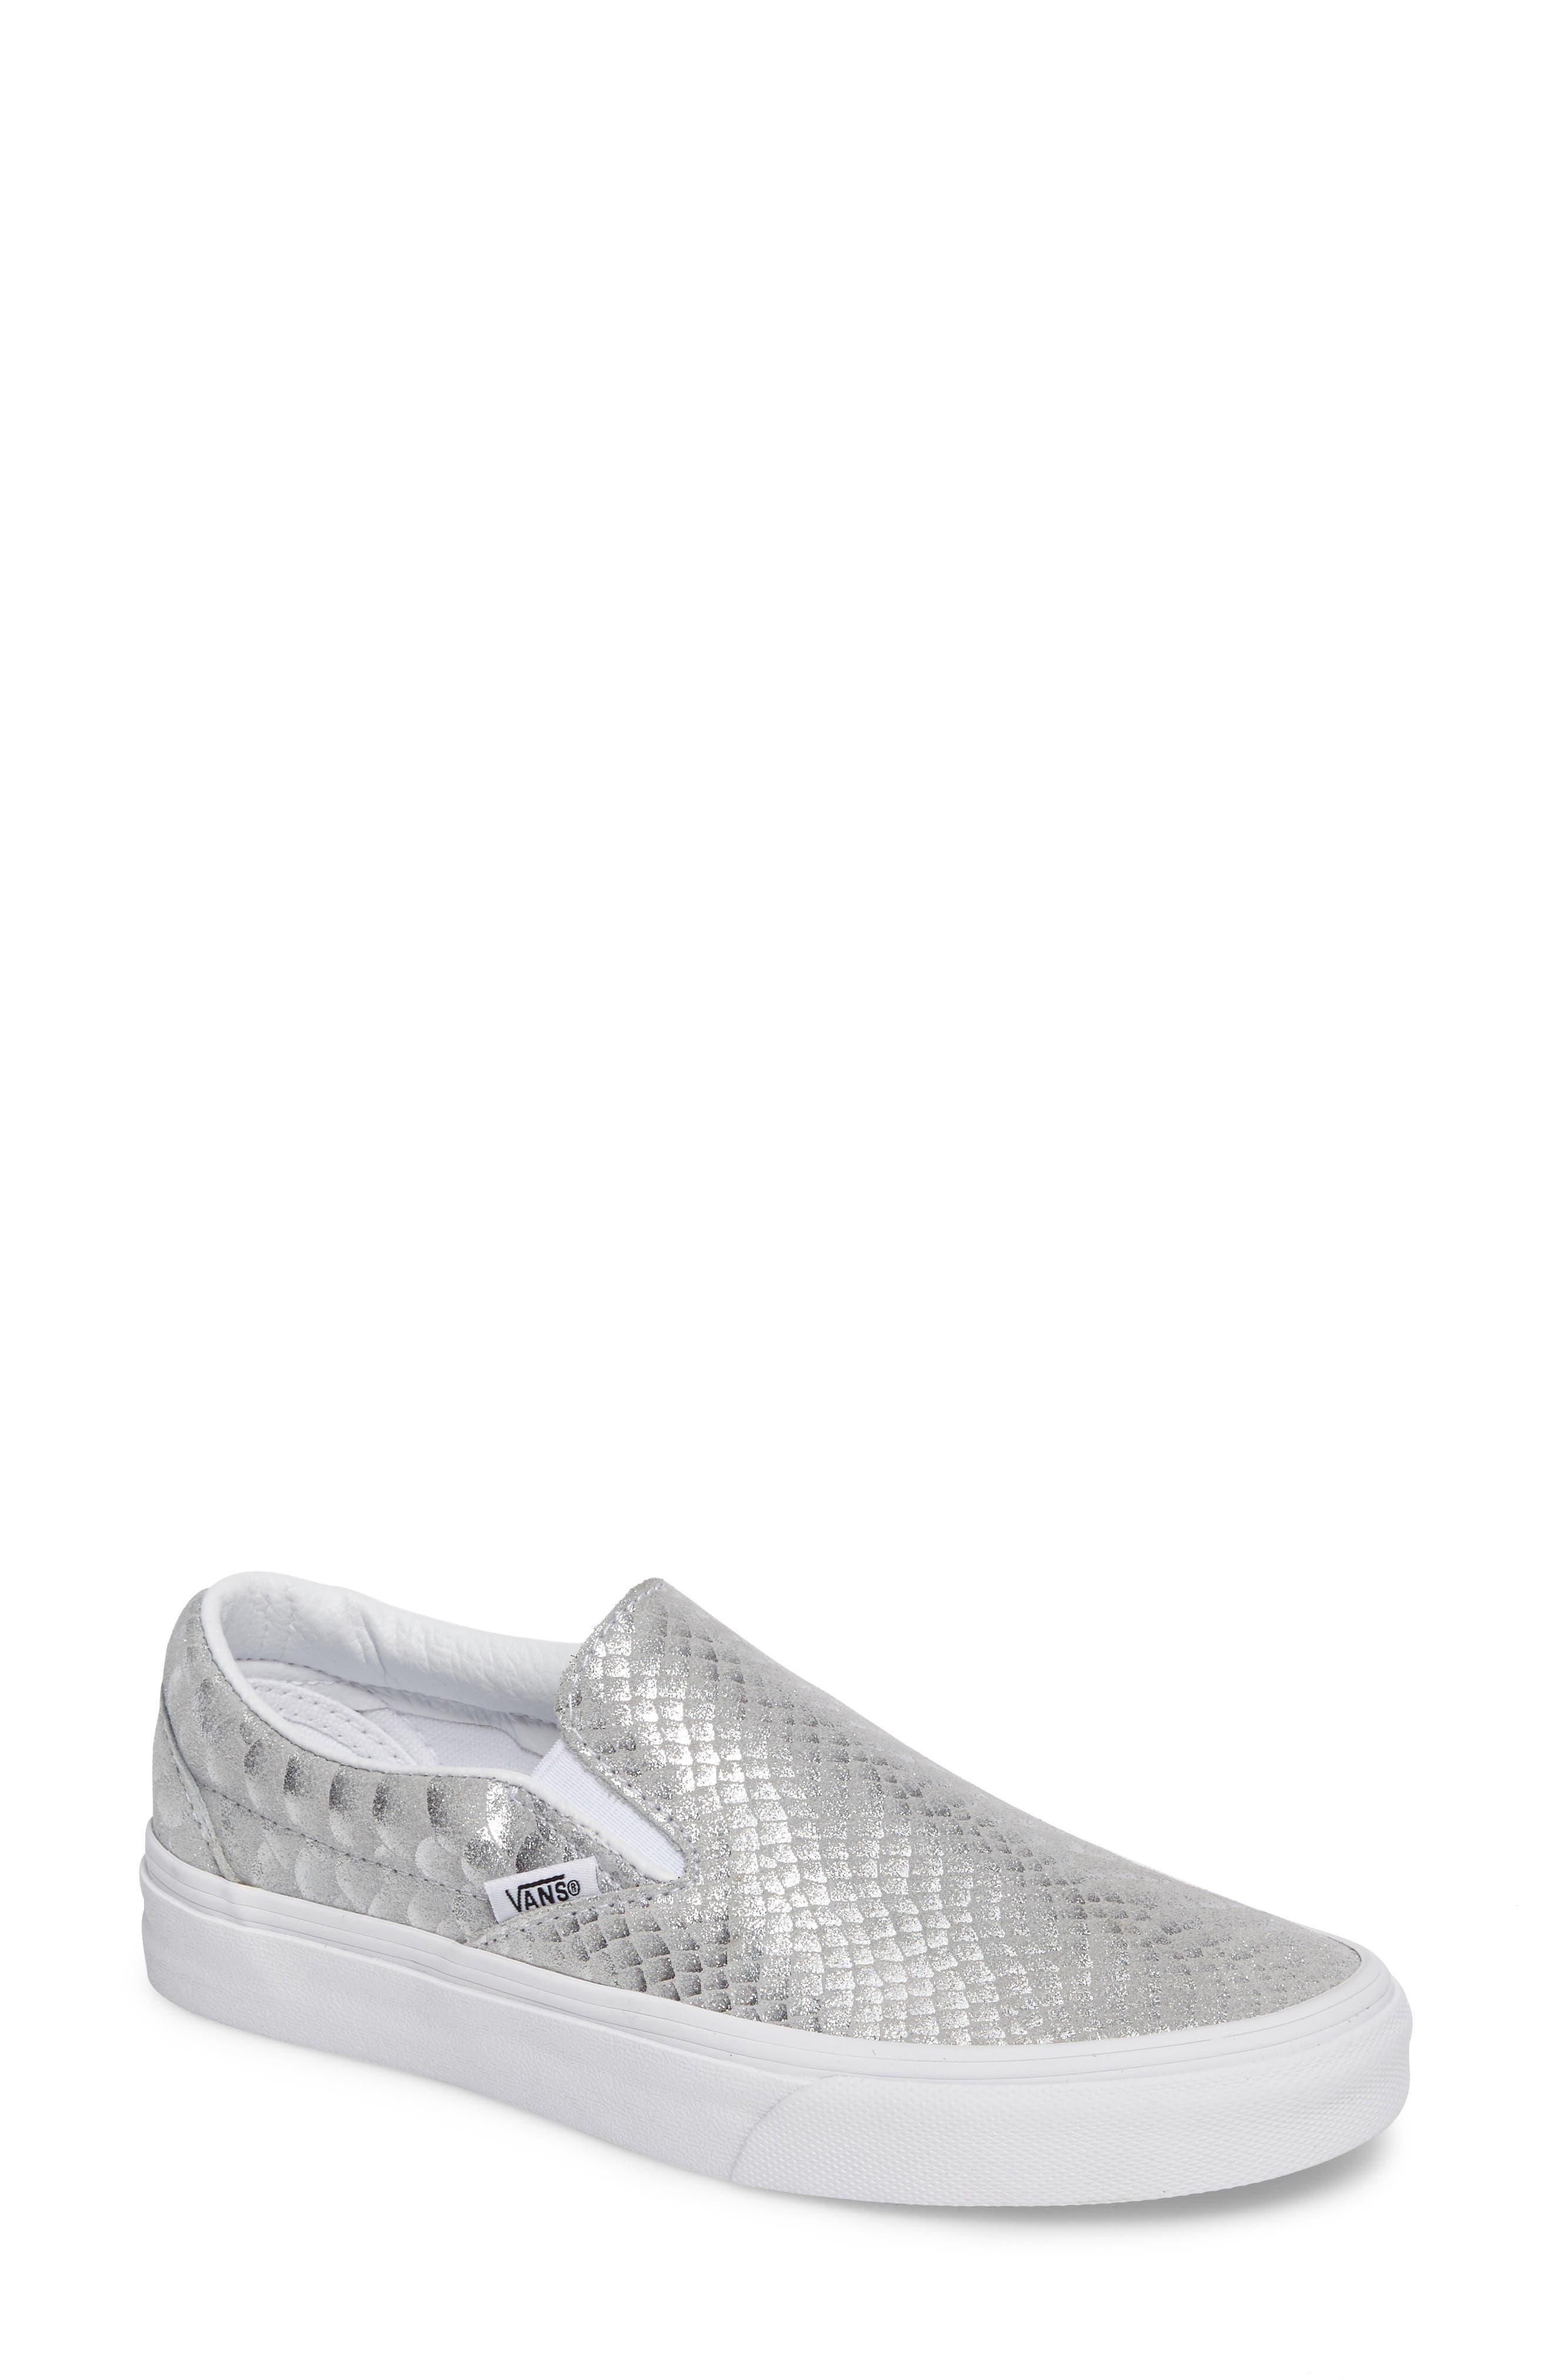 ,                             Classic Slip-On Sneaker,                             Main thumbnail 300, color,                             044